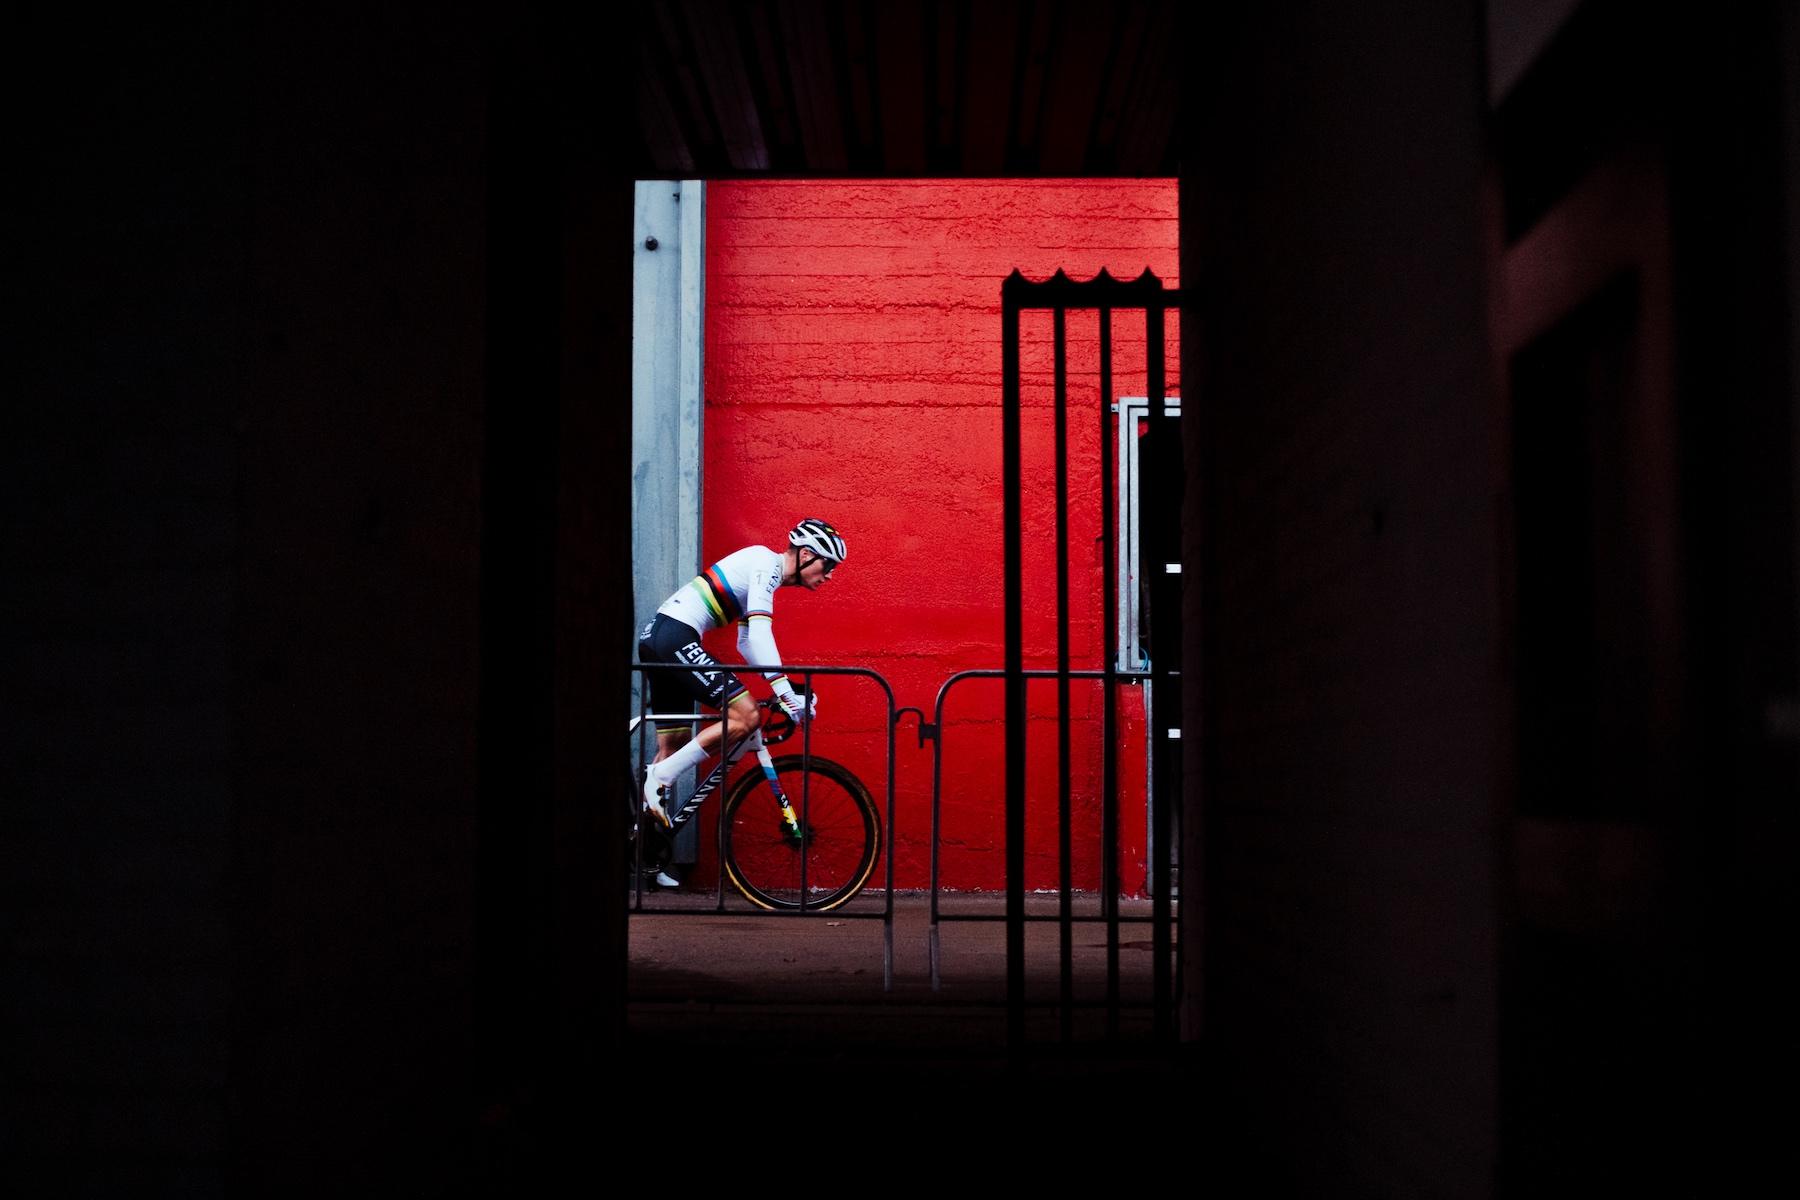 UCI dice che CX Worlds andrà avanti: Daily News Digest